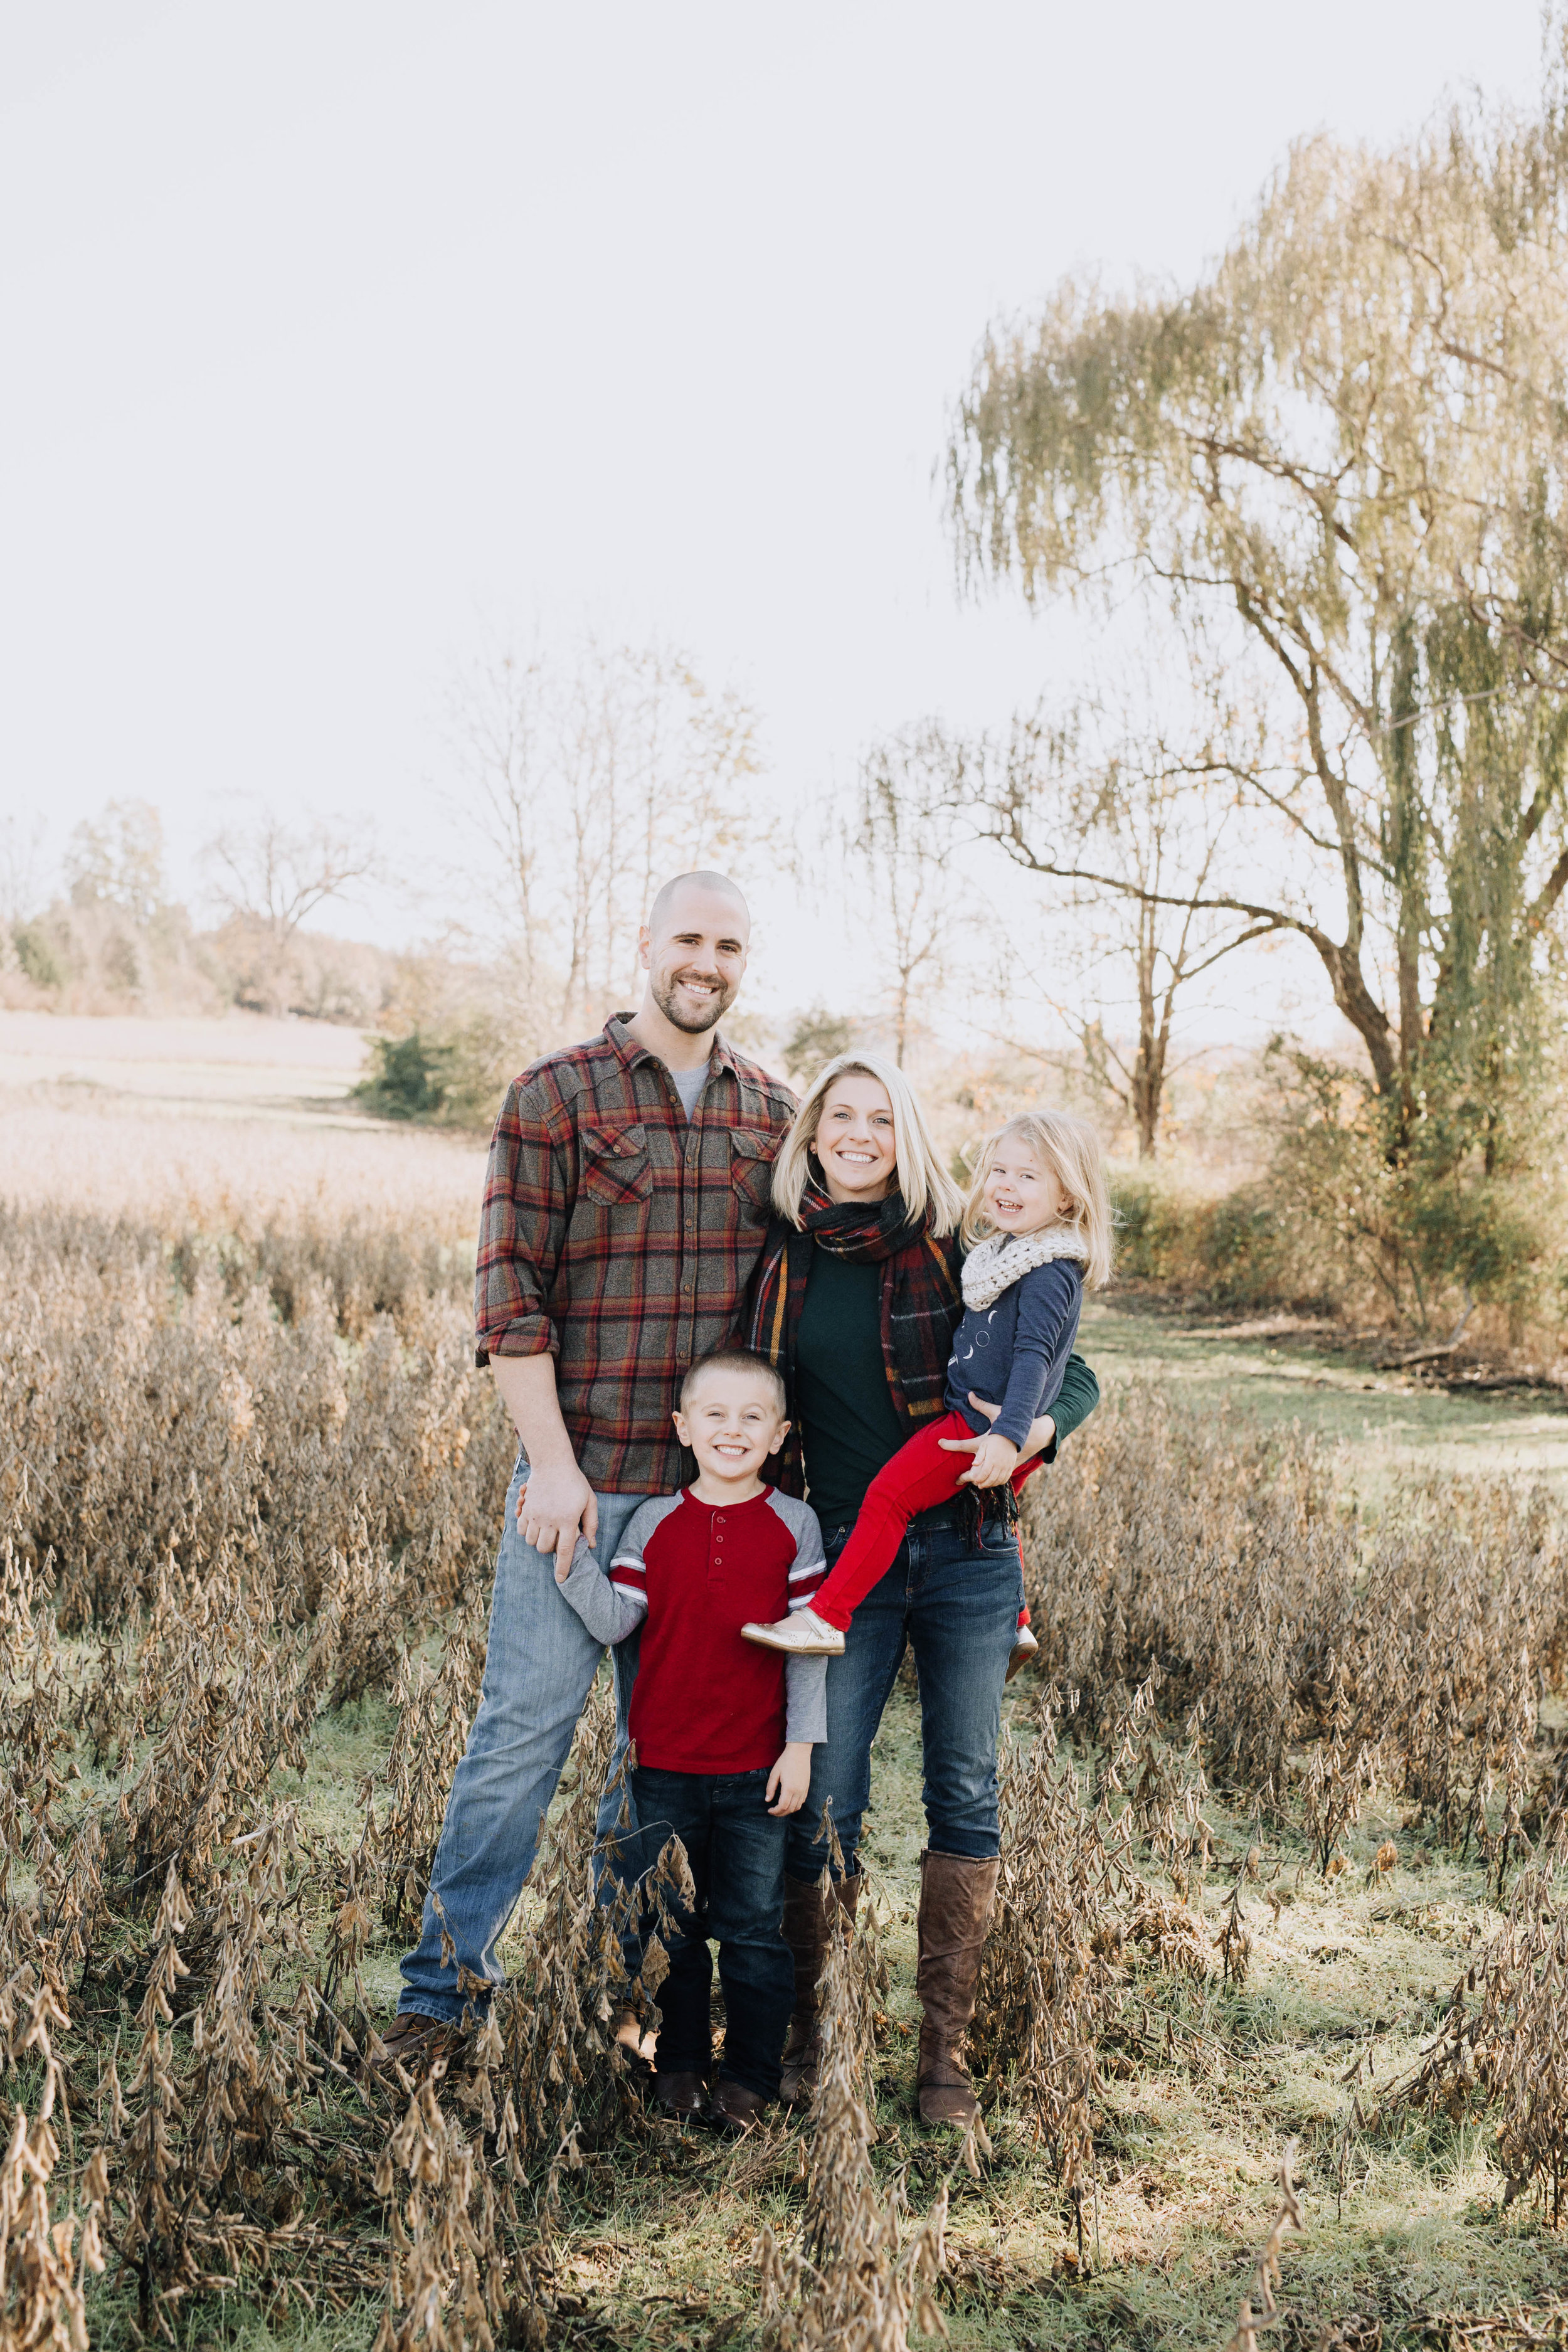 Lick_Run_Fredericksburg_Virginia_Jacqueline_Waters_Photography_Basham_Family_Portraits (4).jpg